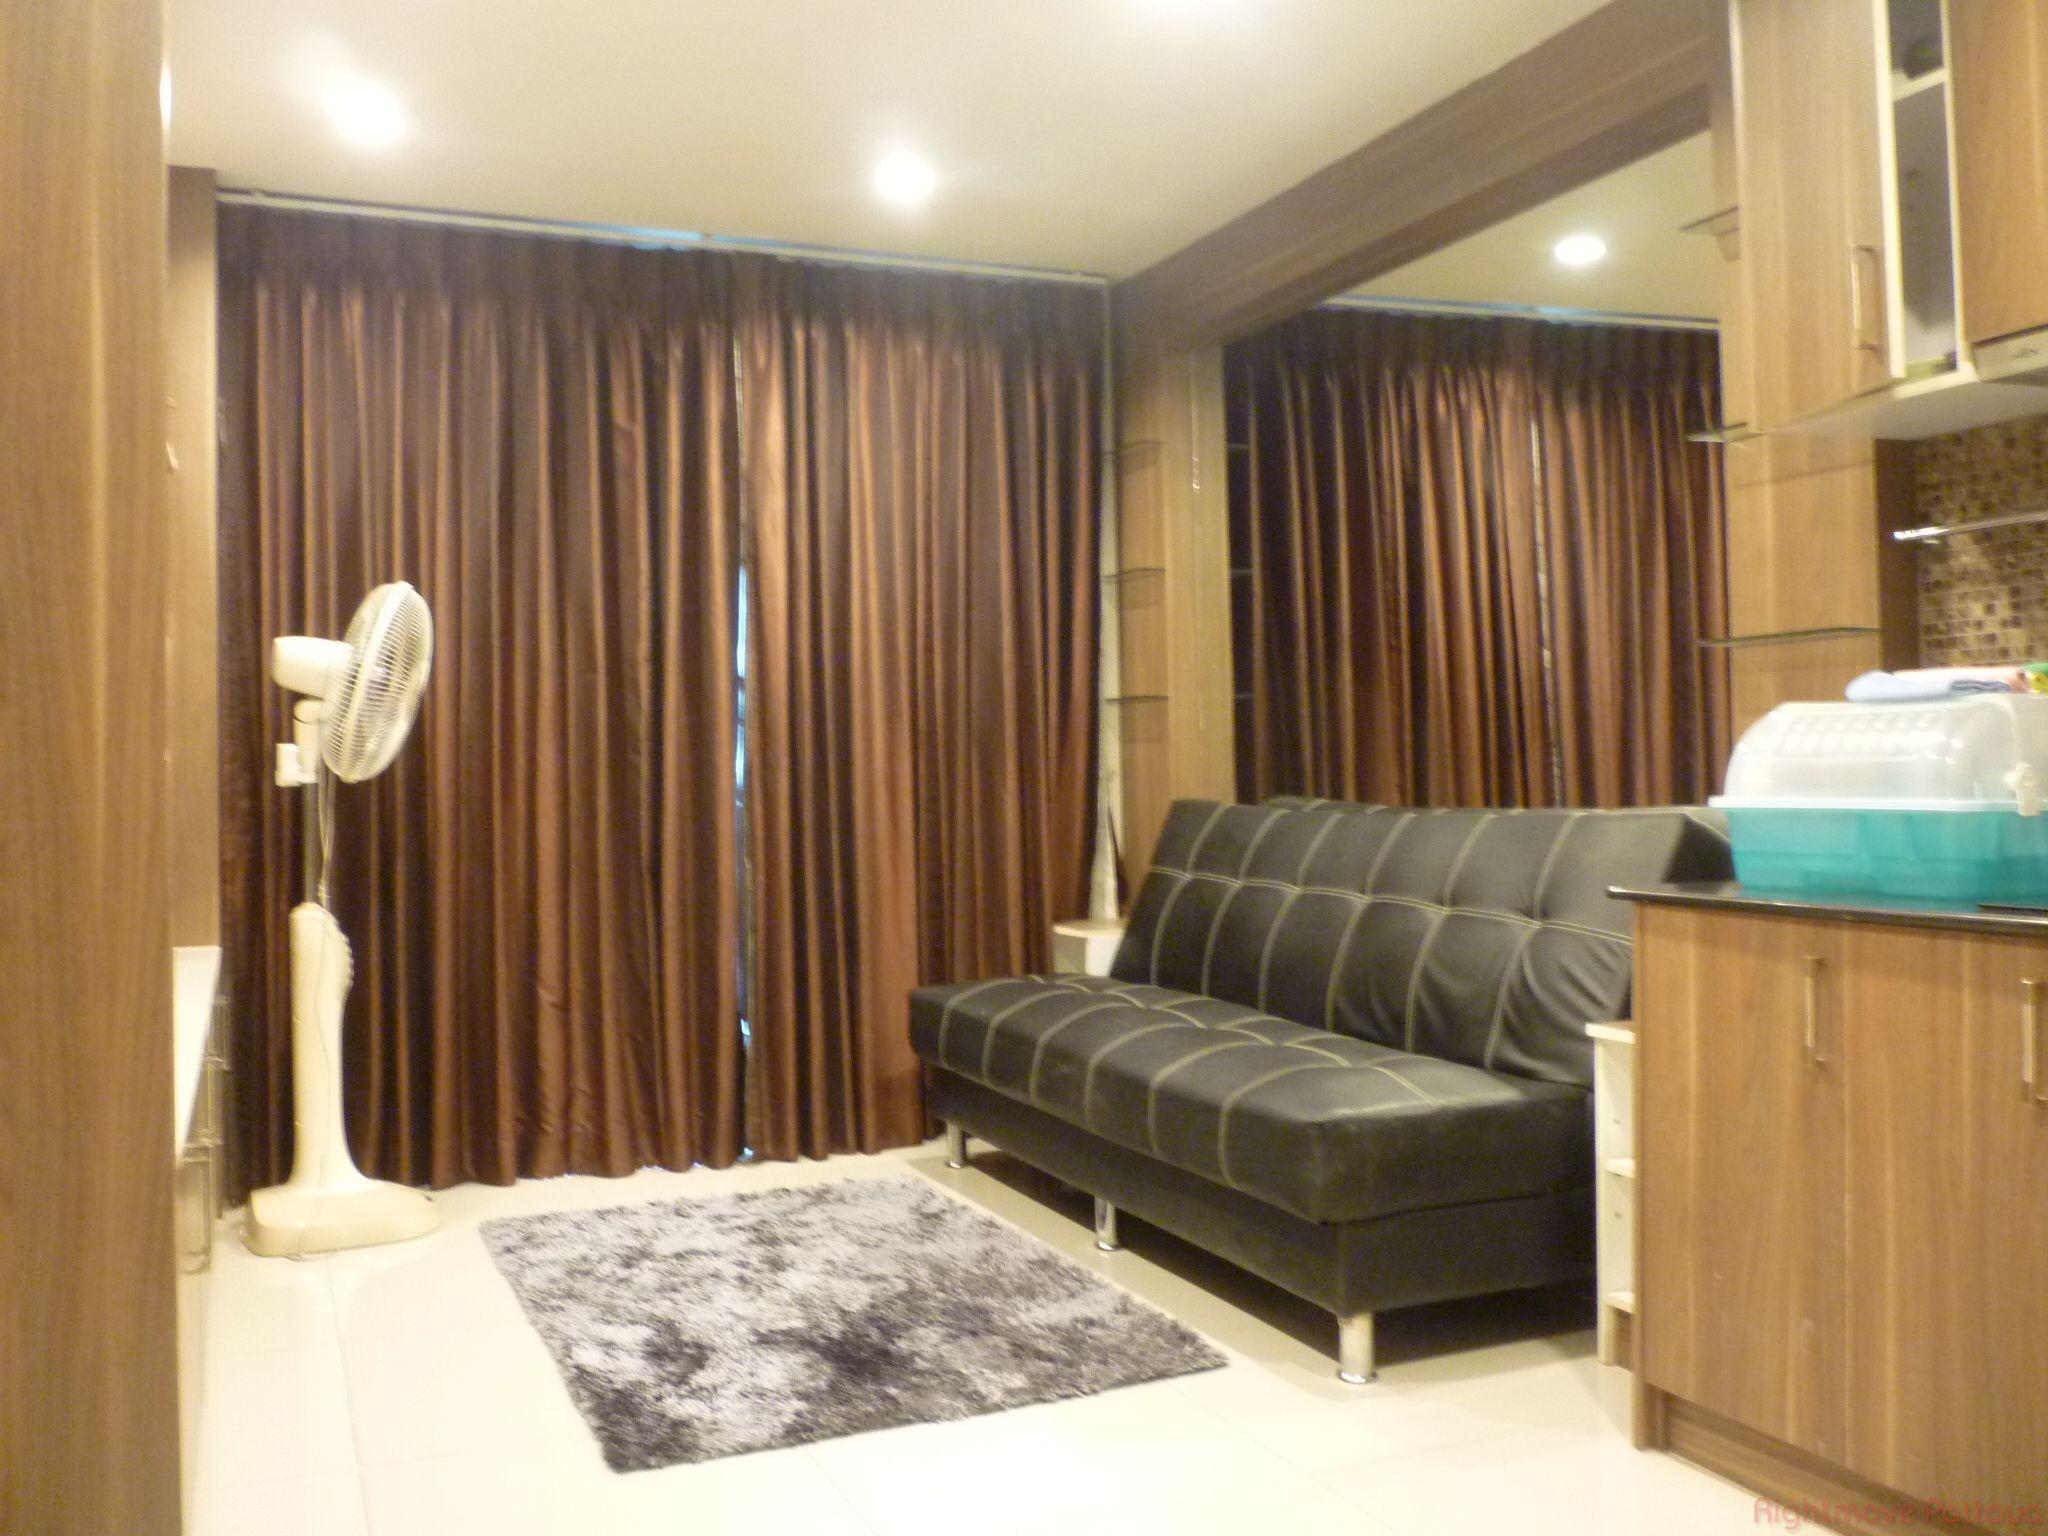 pic-3-Rightmove Pattaya Porchland 2 Jomtien Resort Condominiums for sale in Jomtien Pattaya